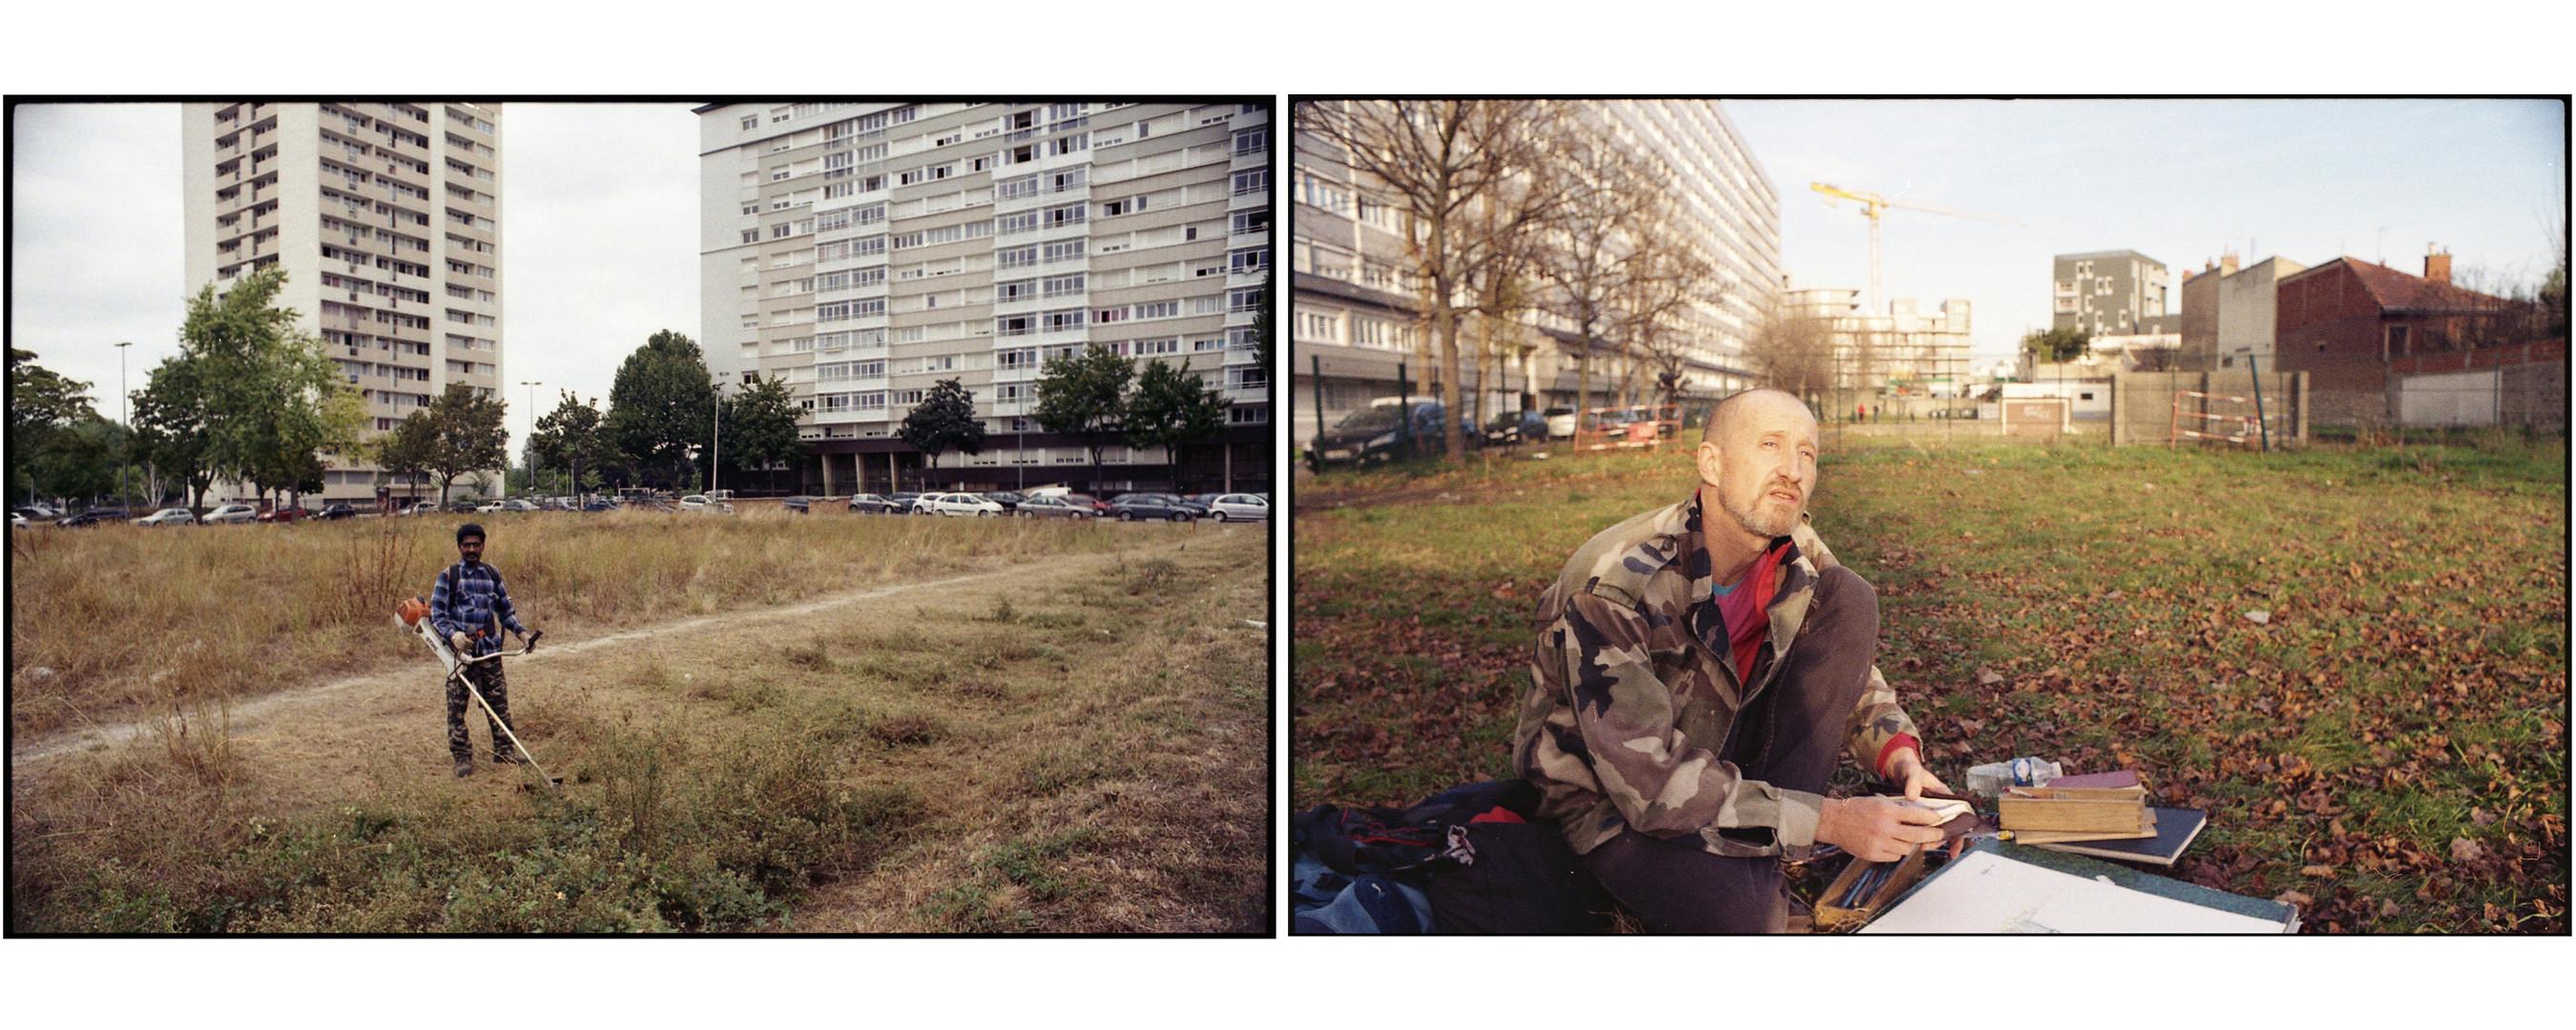 Duo_immeuble_genevilliers.jpg